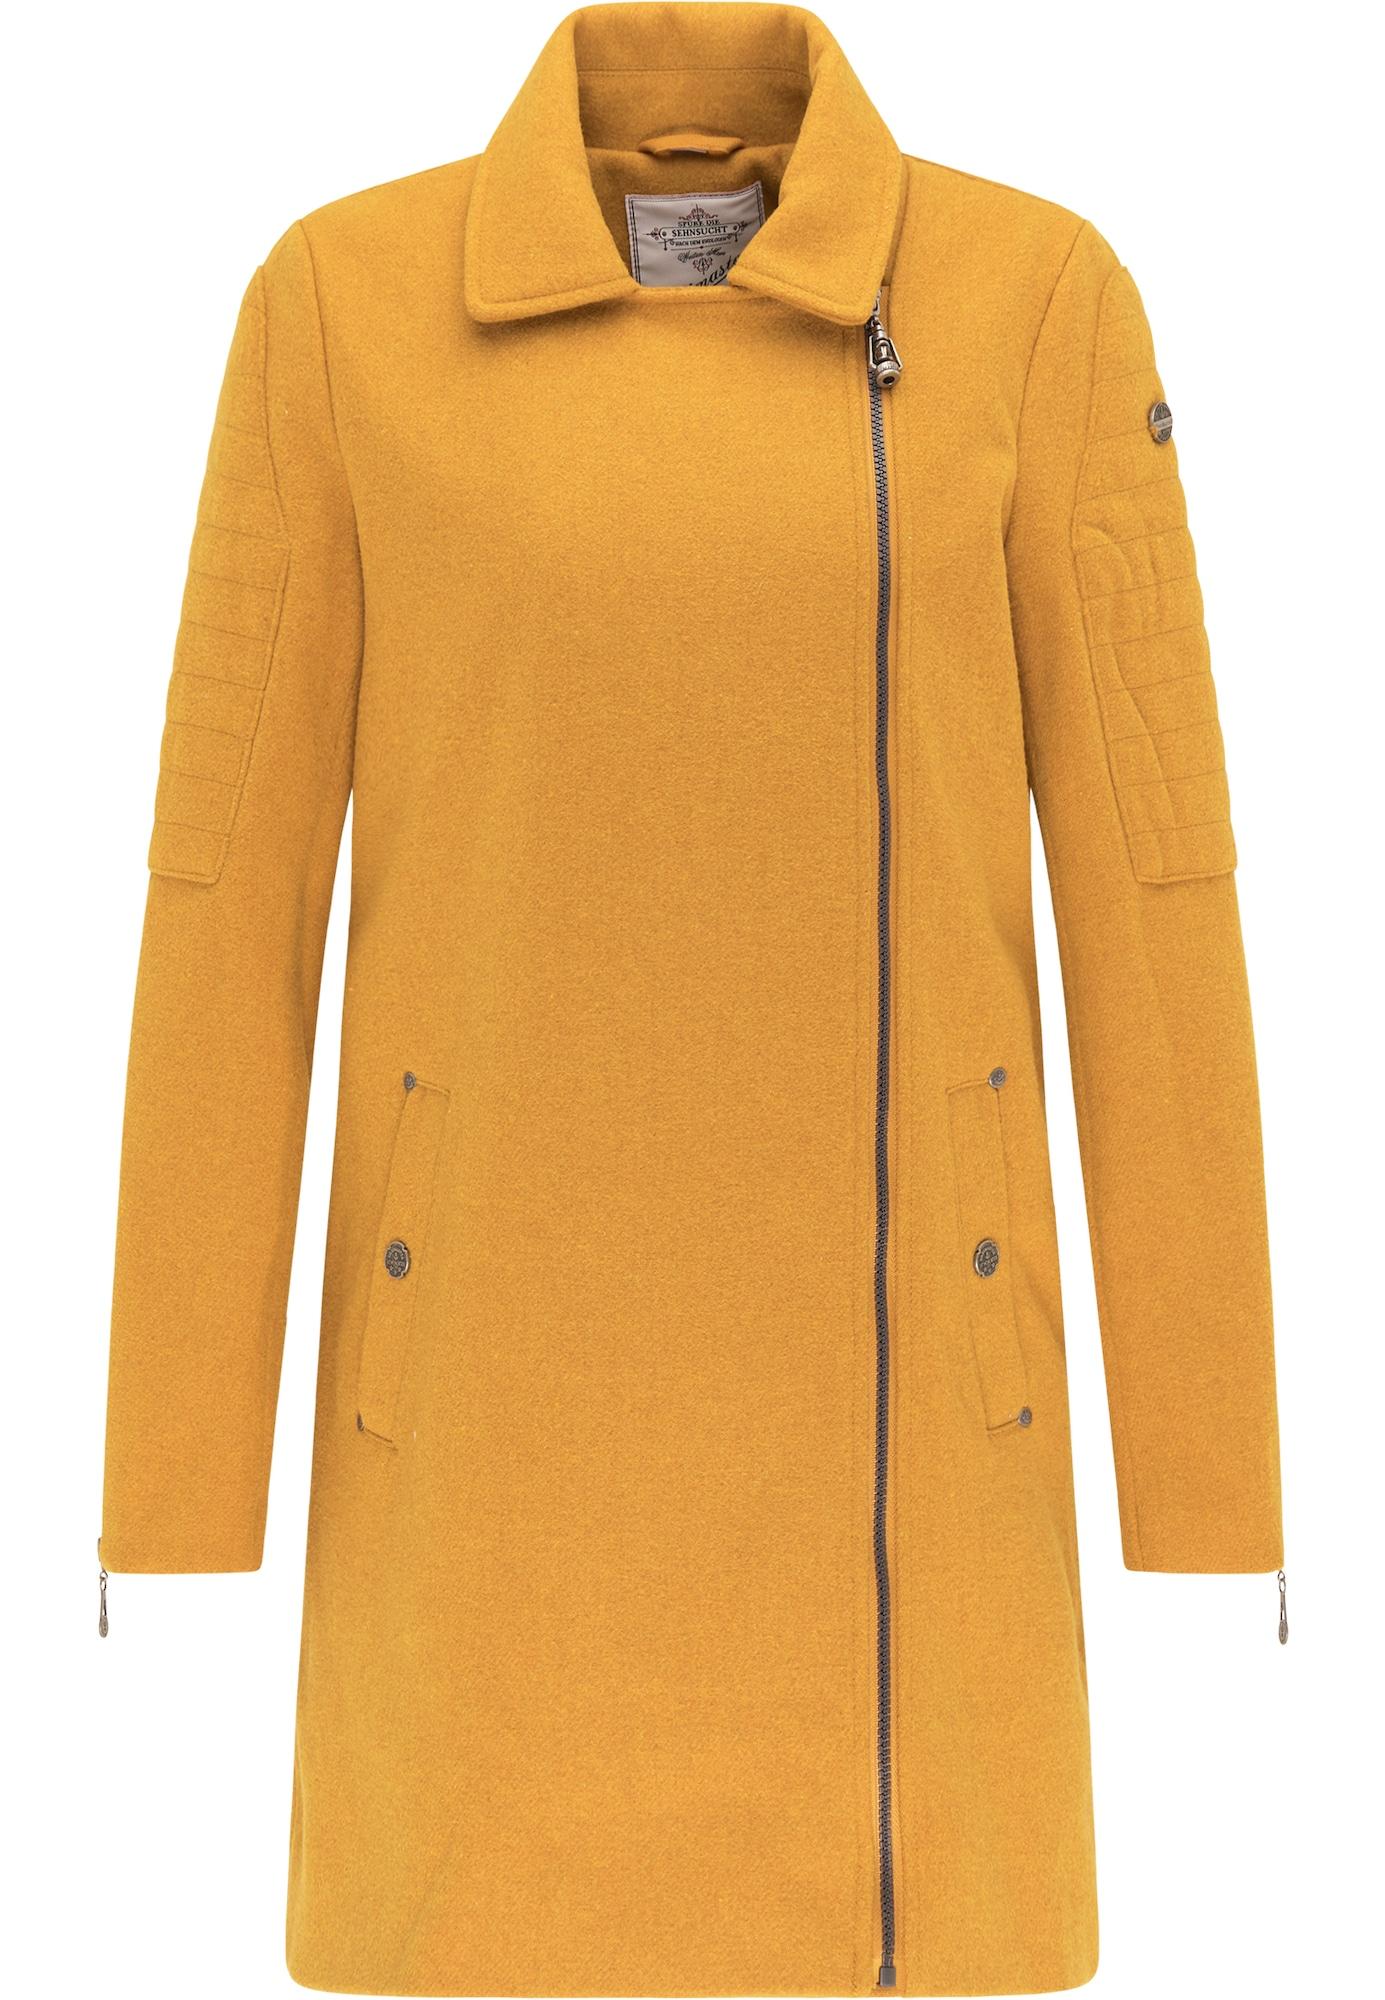 DreiMaster Vintage Demisezoninis paltas aukso geltonumo spalva